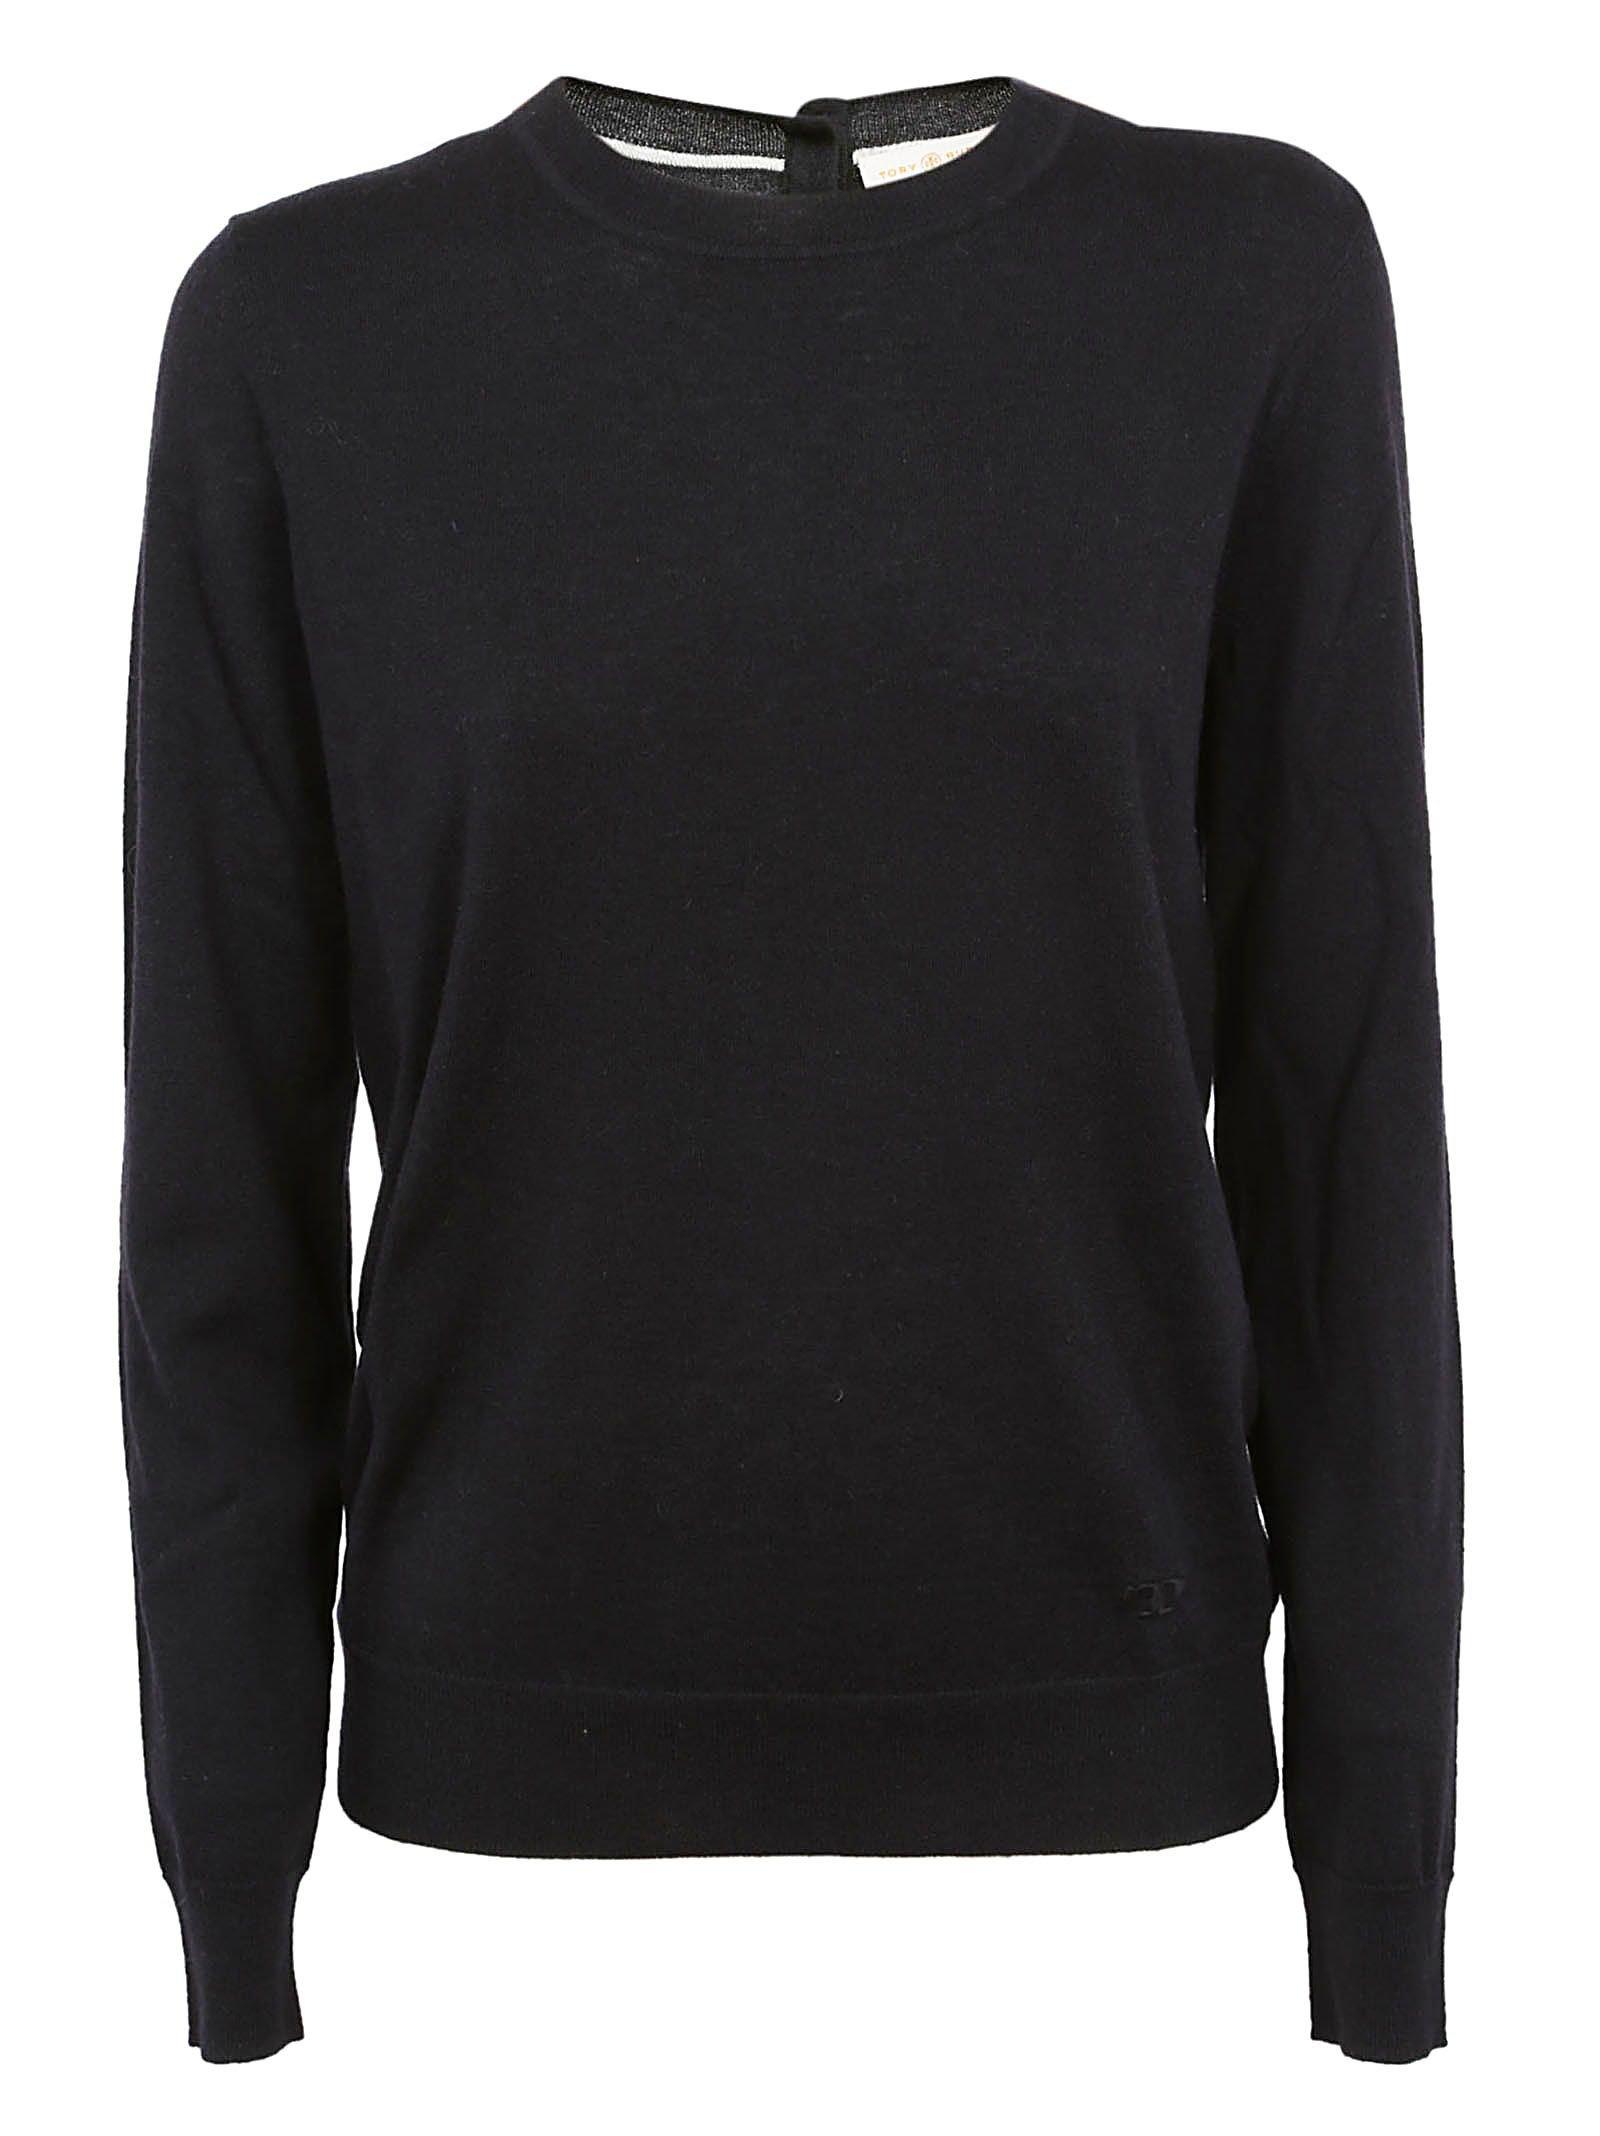 Tory Burch Iberia Sweater